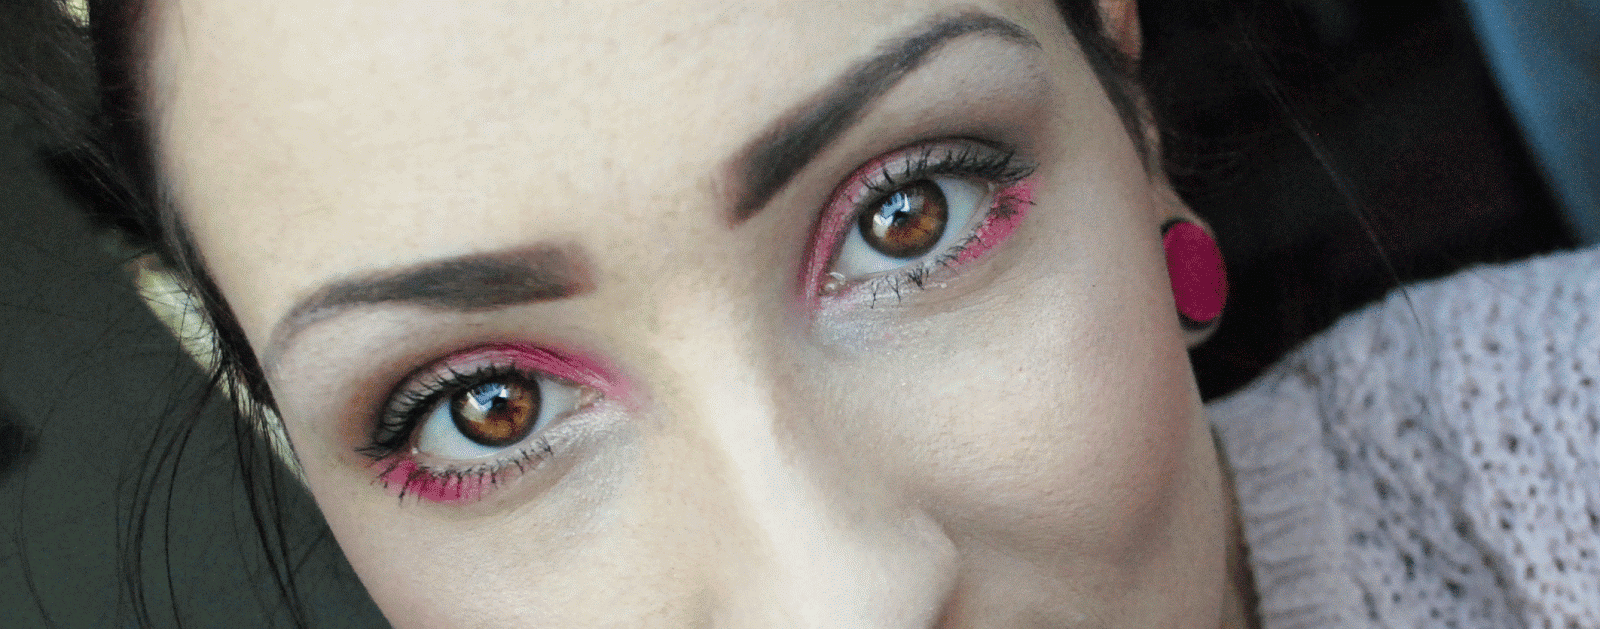 PinkOctober_www.frenchvanilla.eu